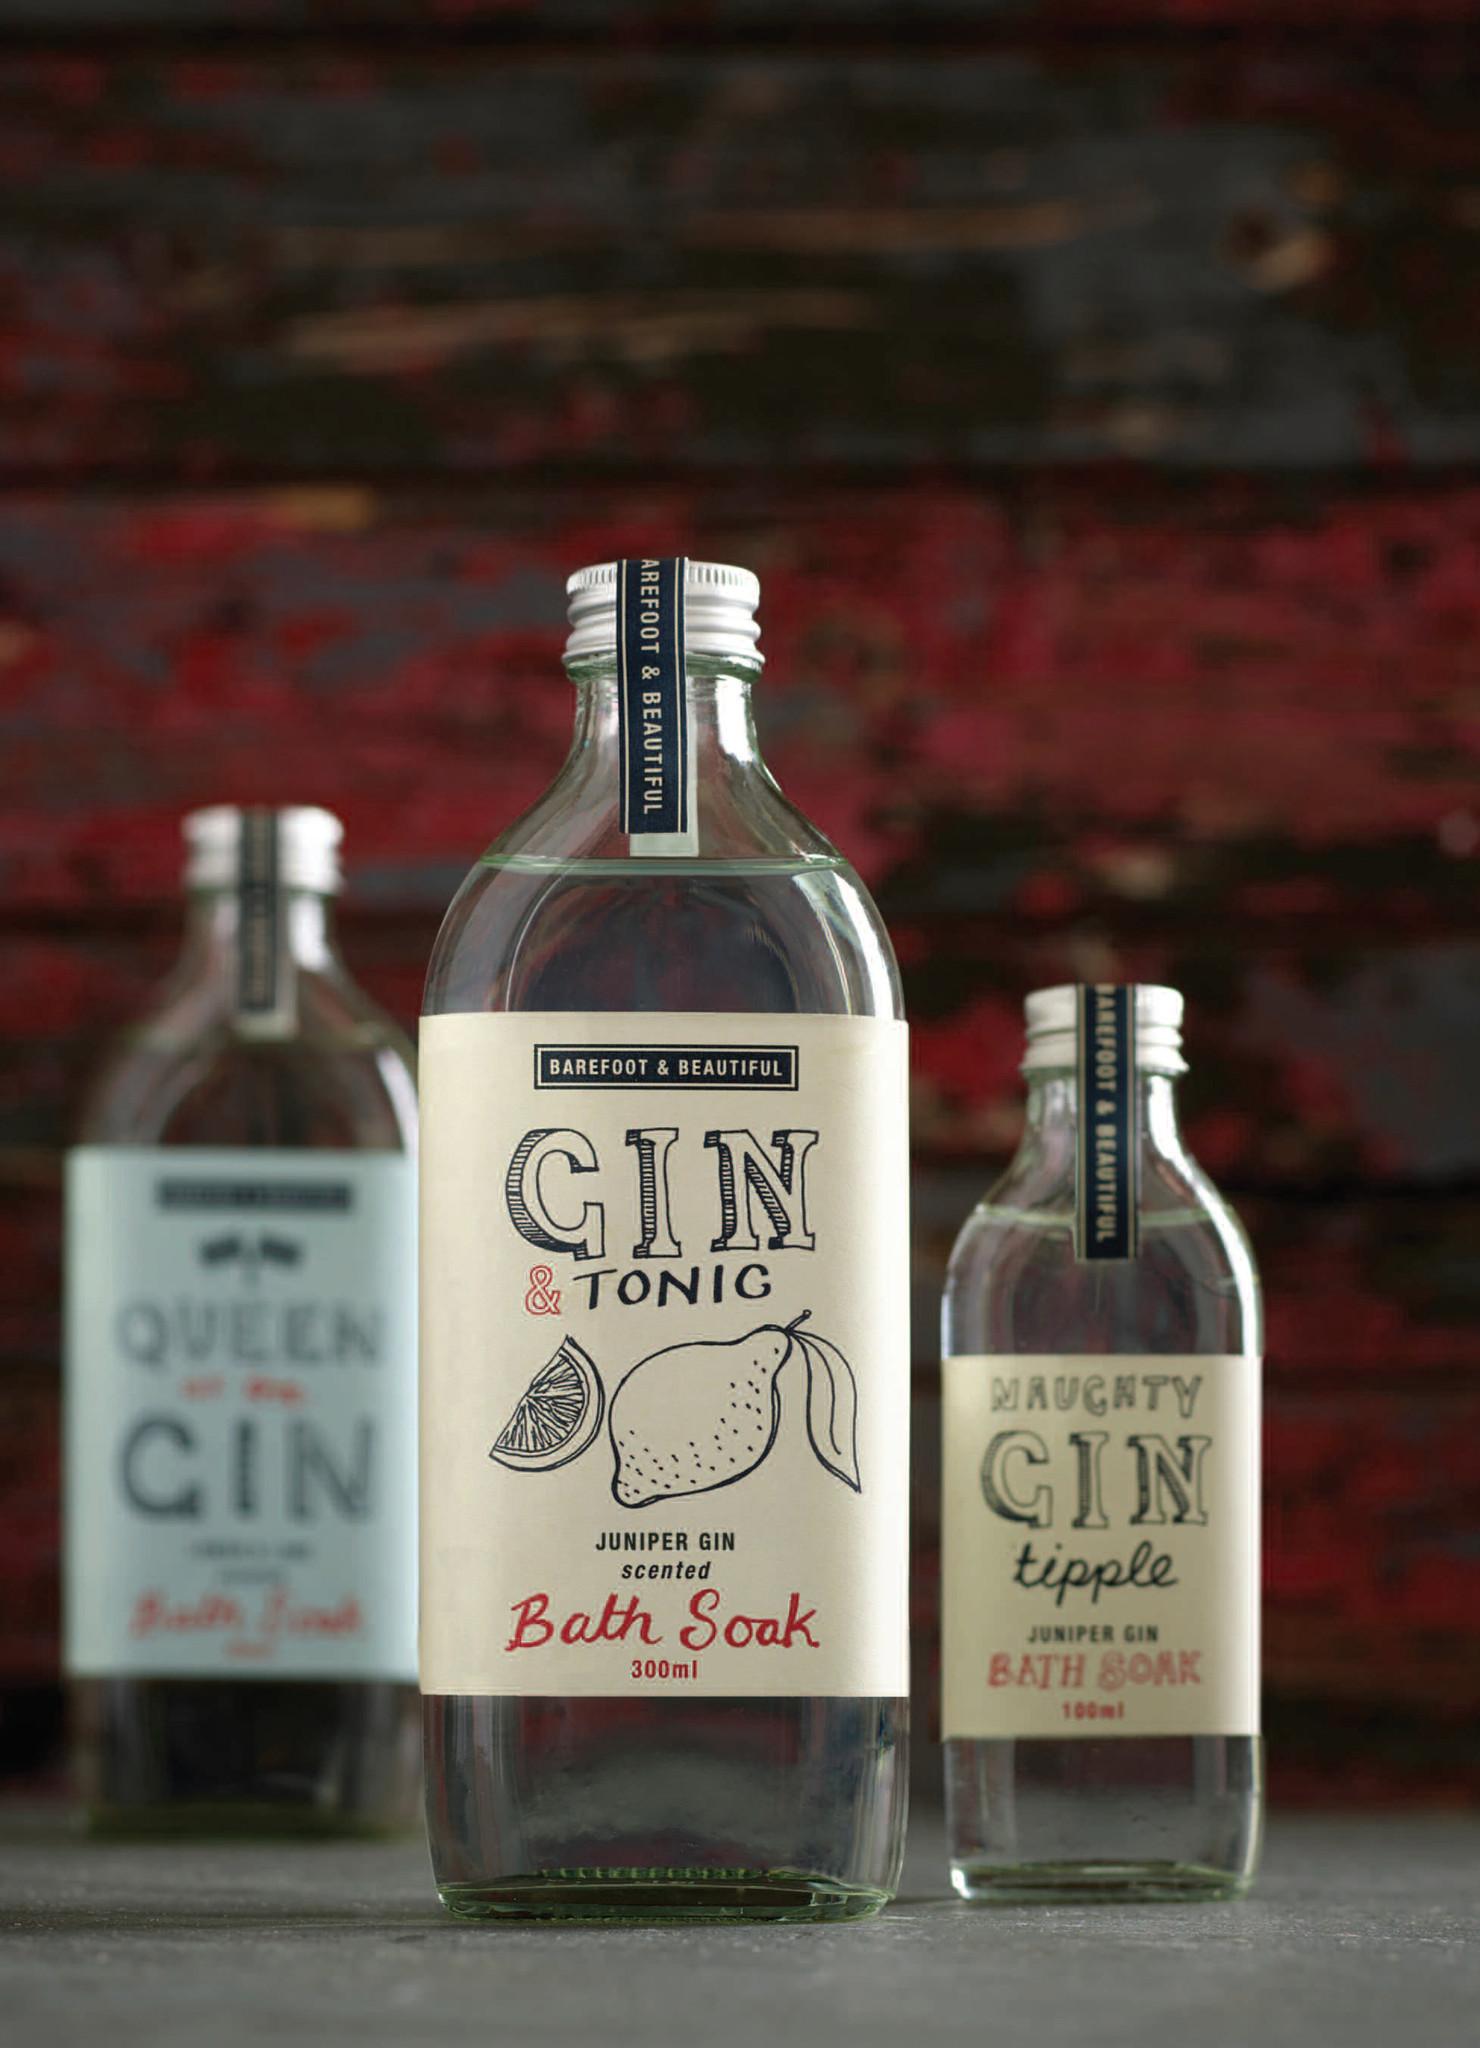 Barefoot & Beautiful Gin Tonic